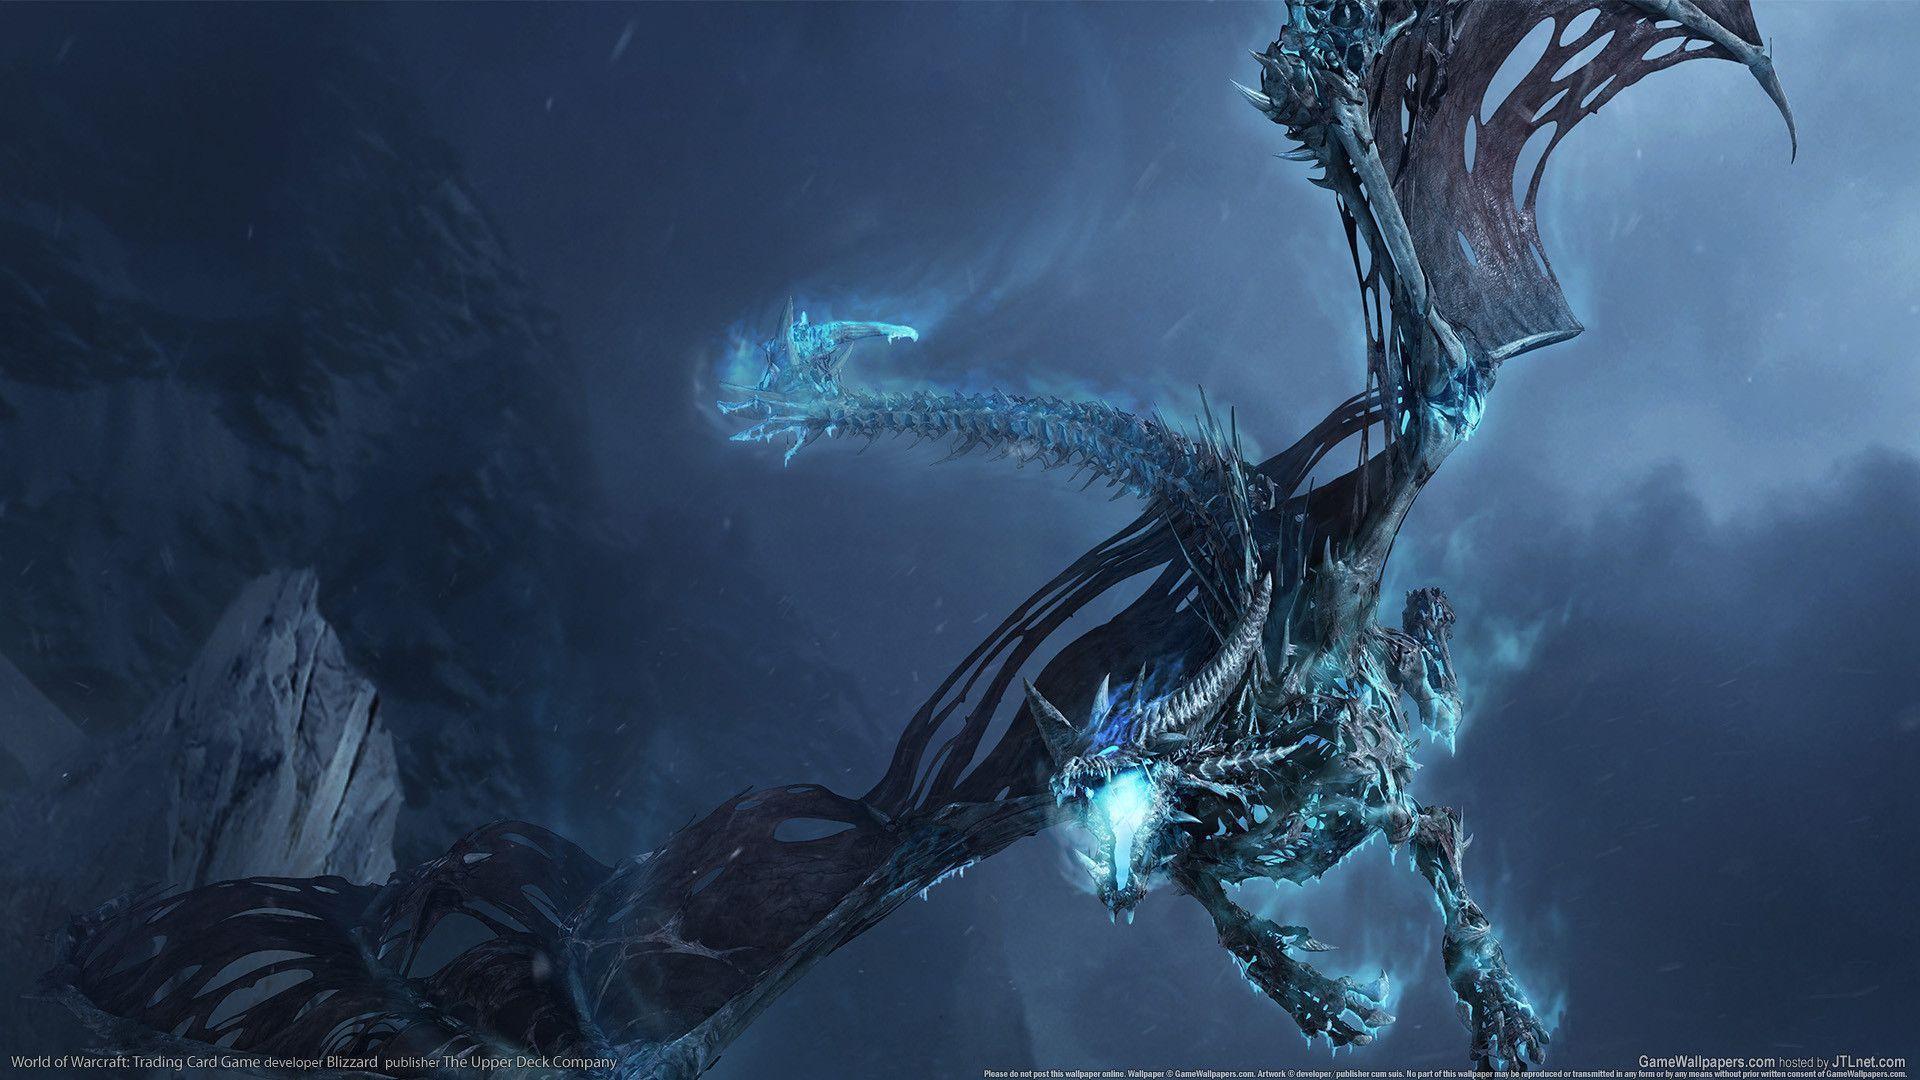 World Of Warcraft HD Wallpaper 1920x1080